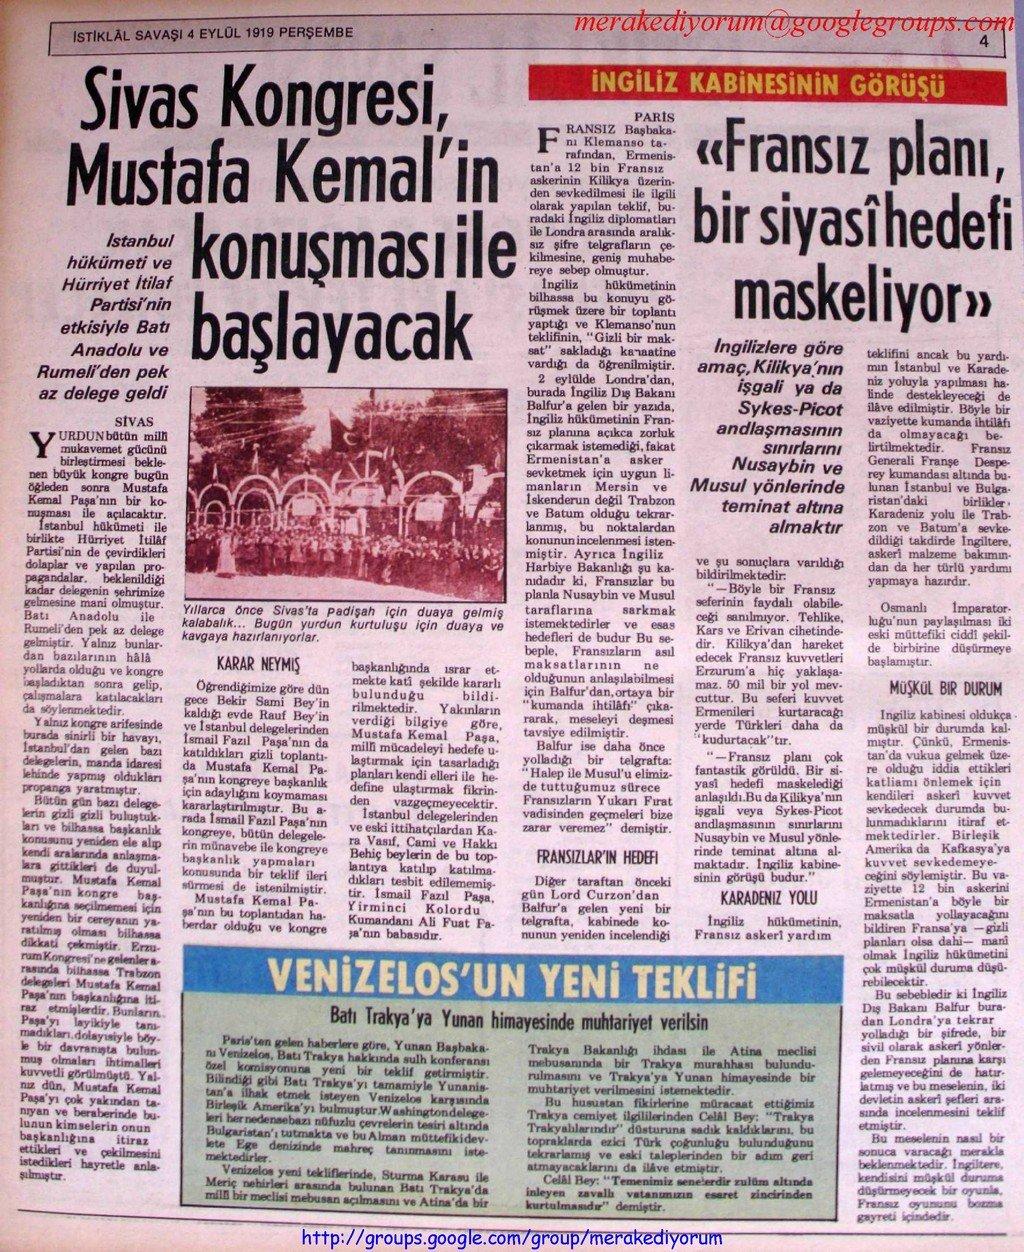 istiklal savaşı gazetesi - 4 eylül 1919